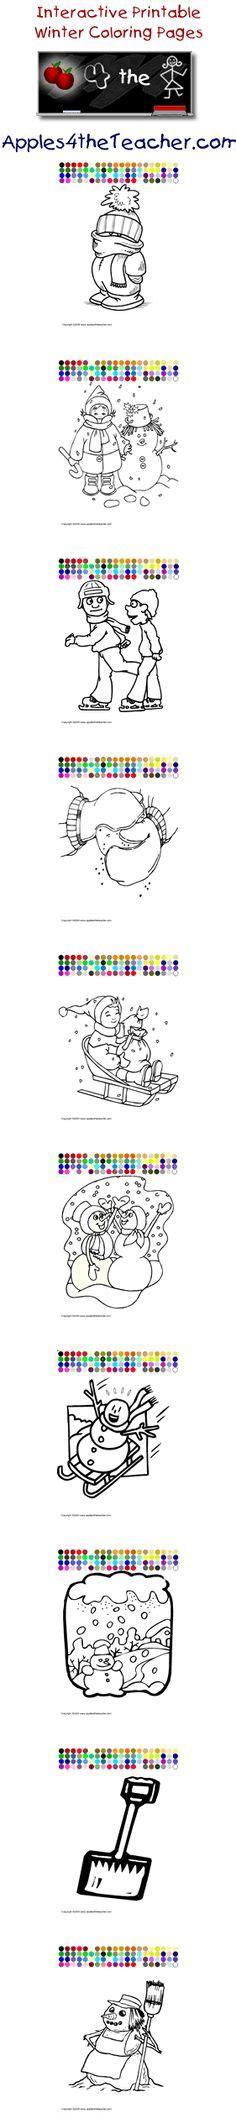 Apples4theteacher Com Coloring Pages - Democraciaejustica